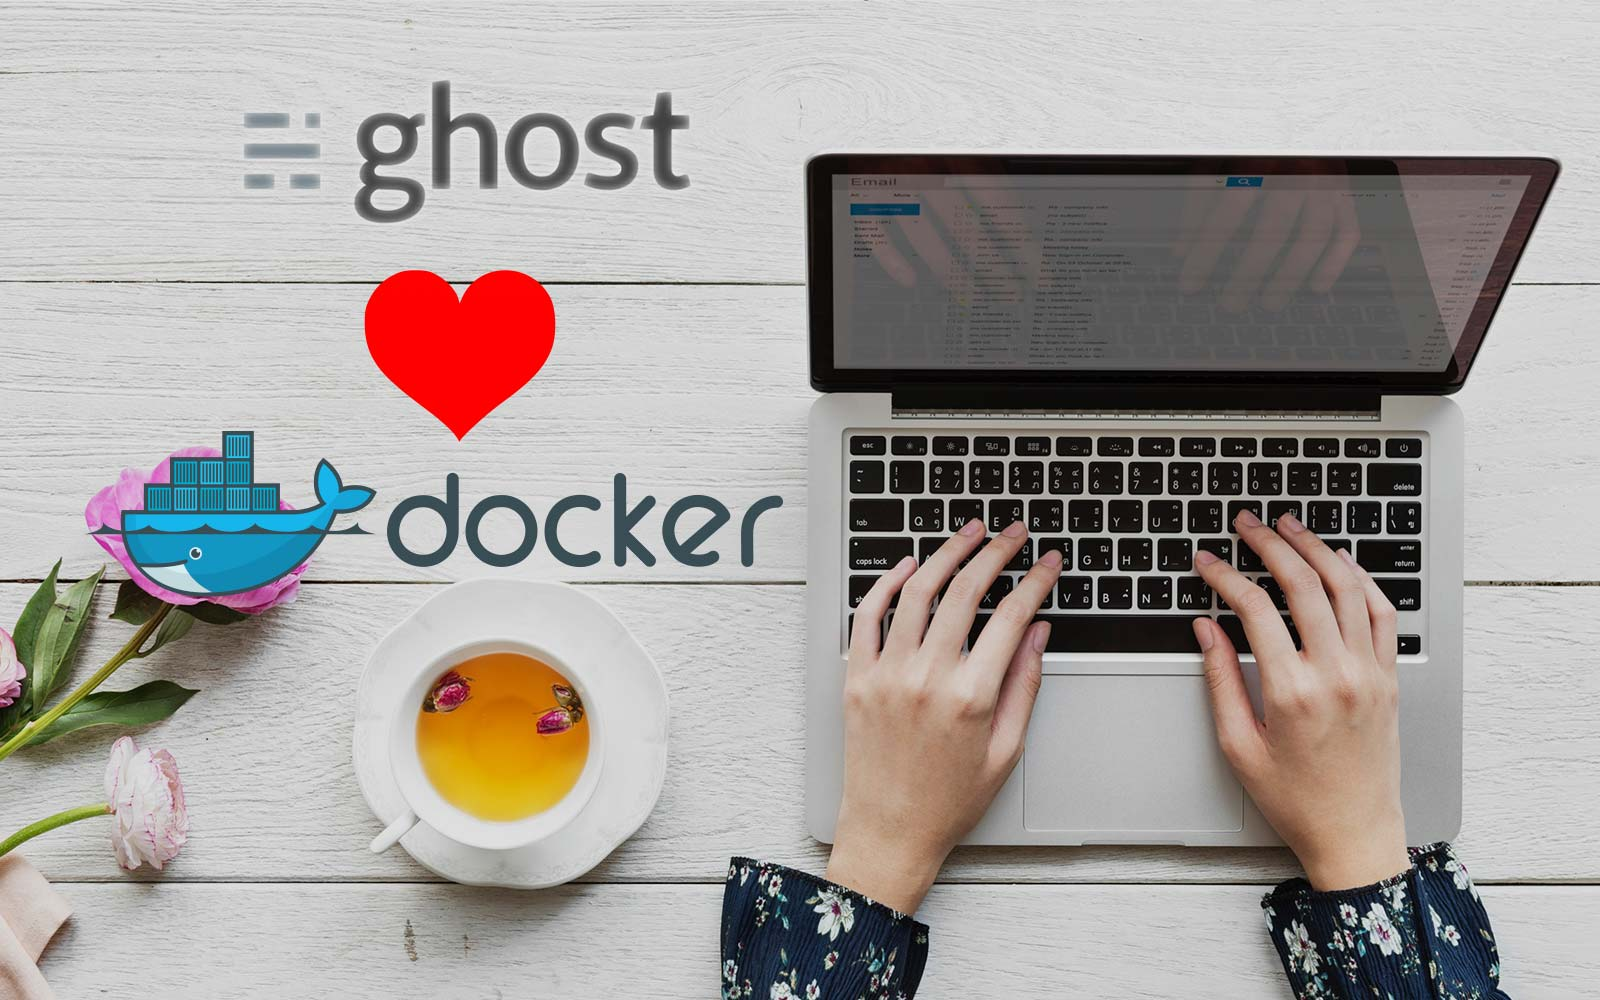 Run a Self Updating Ghost Blog with Docker